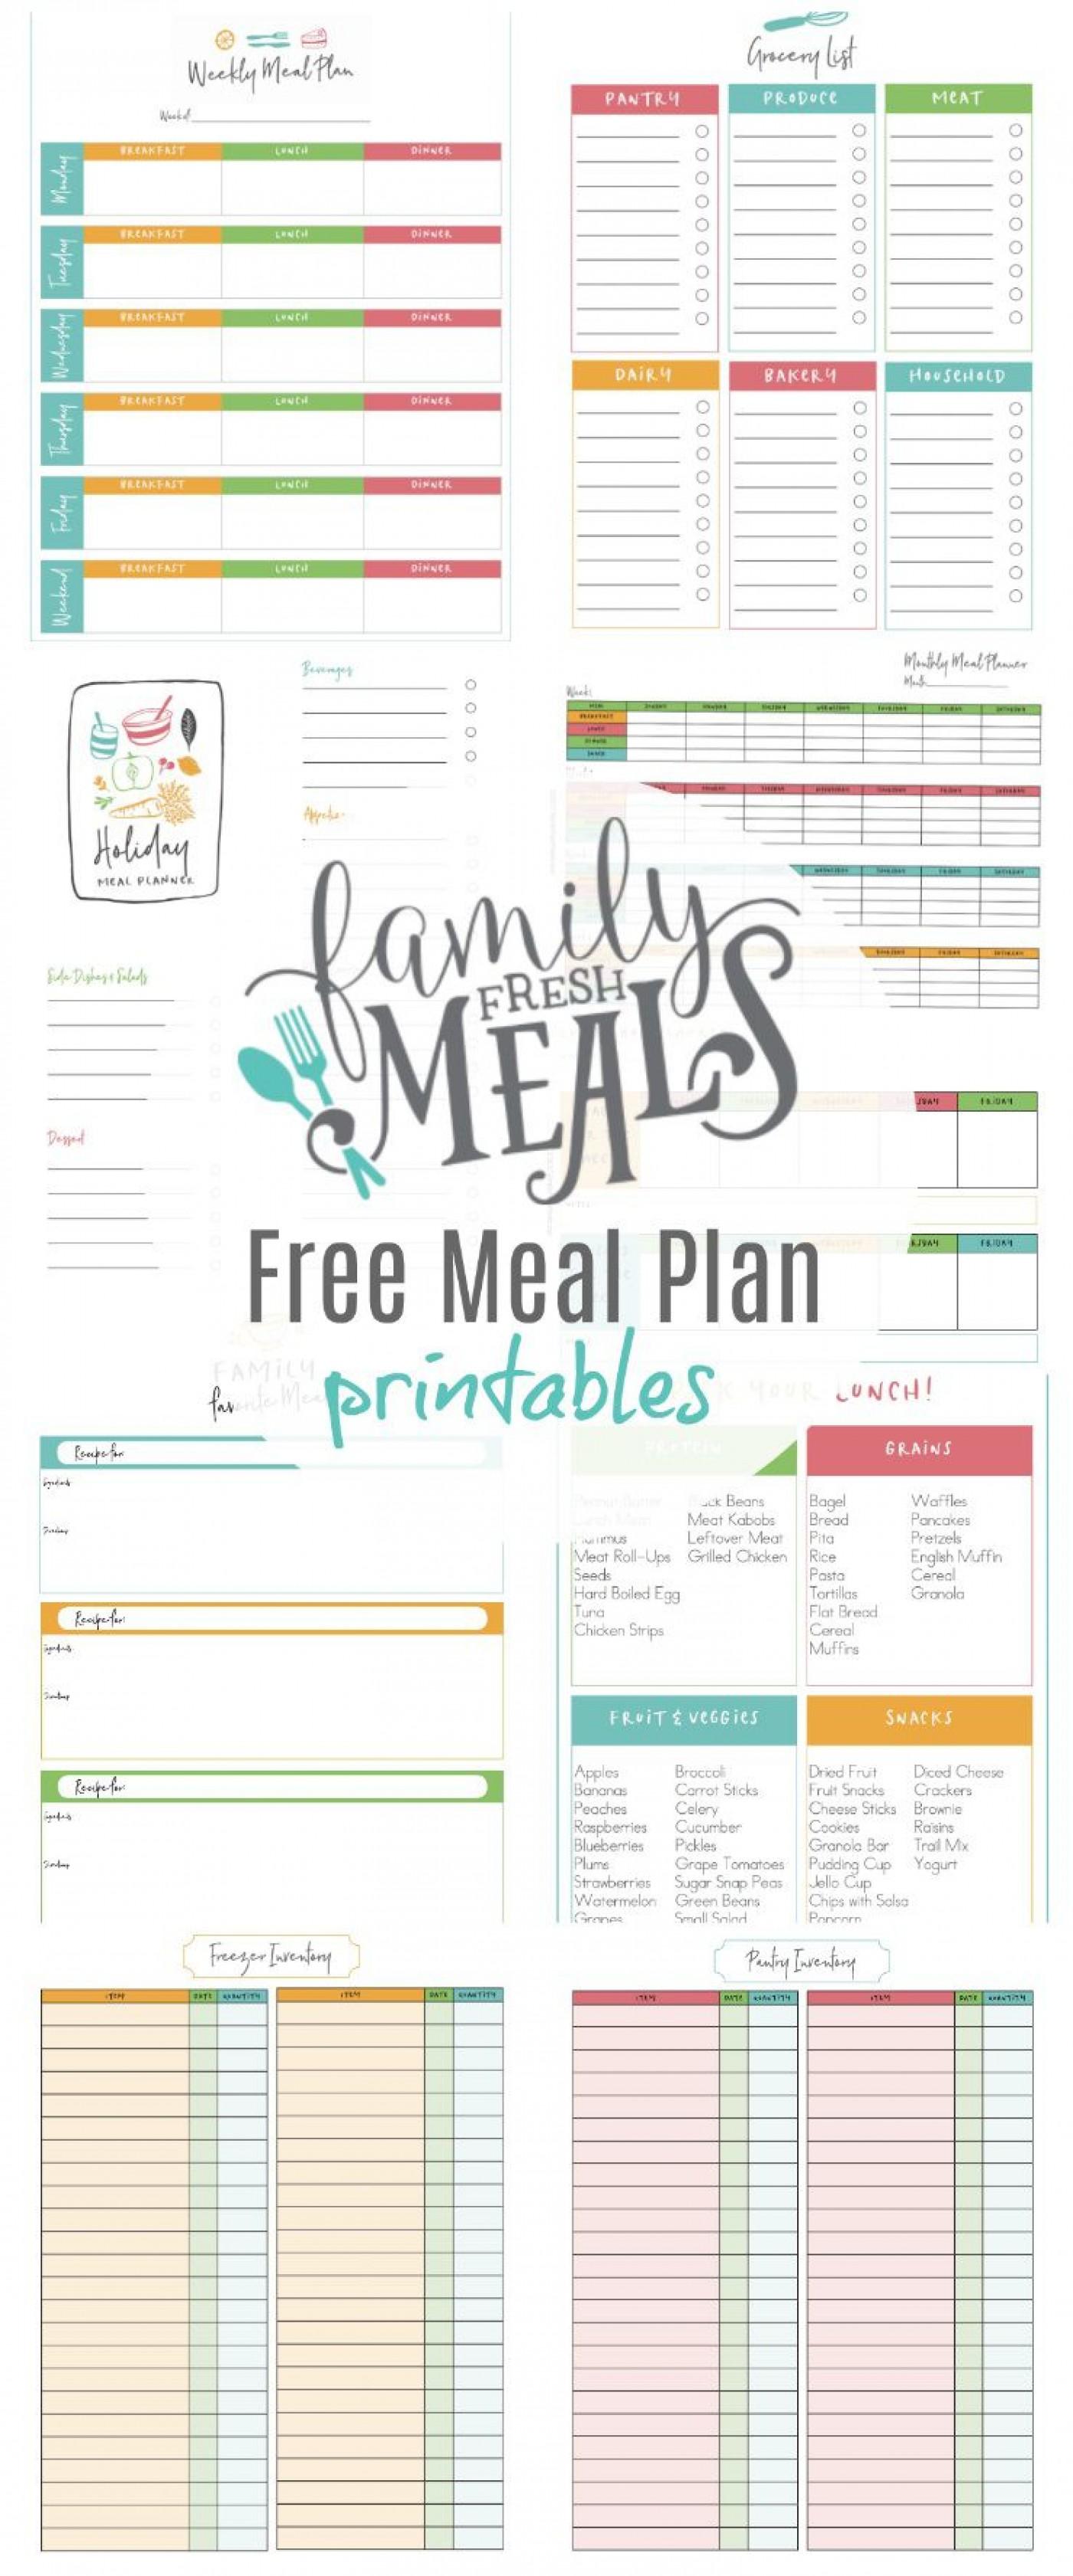 003 Unbelievable Meal Plan Printable Pdf Photo  Worksheet Downloadable Template Sheet1400